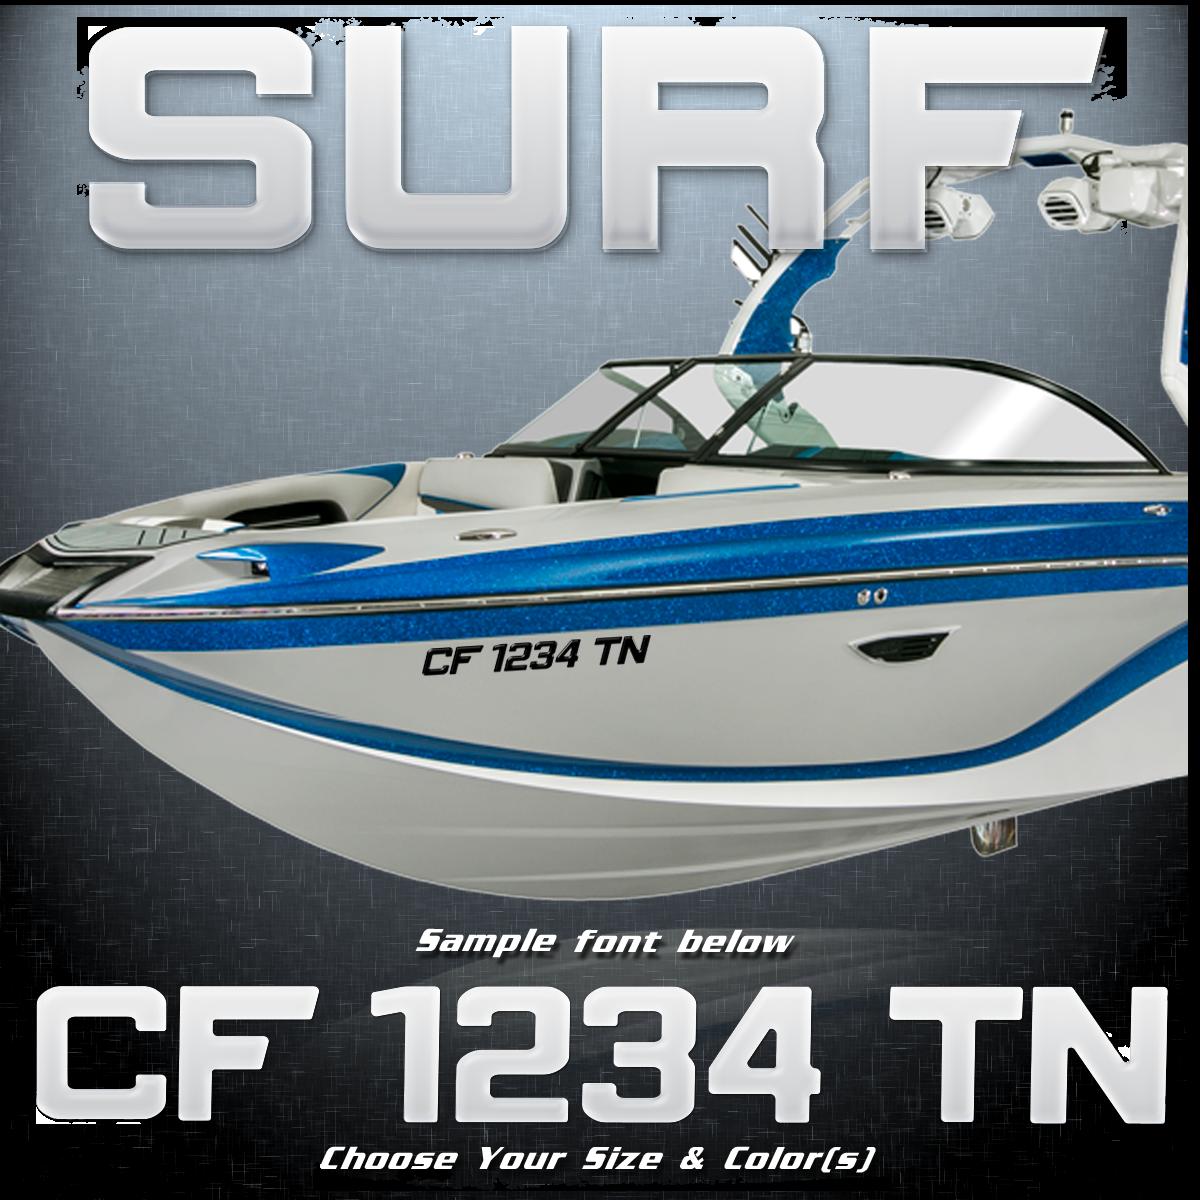 Centurion Surf 2012-17 Registration (2 included), Choose Your Own Colors